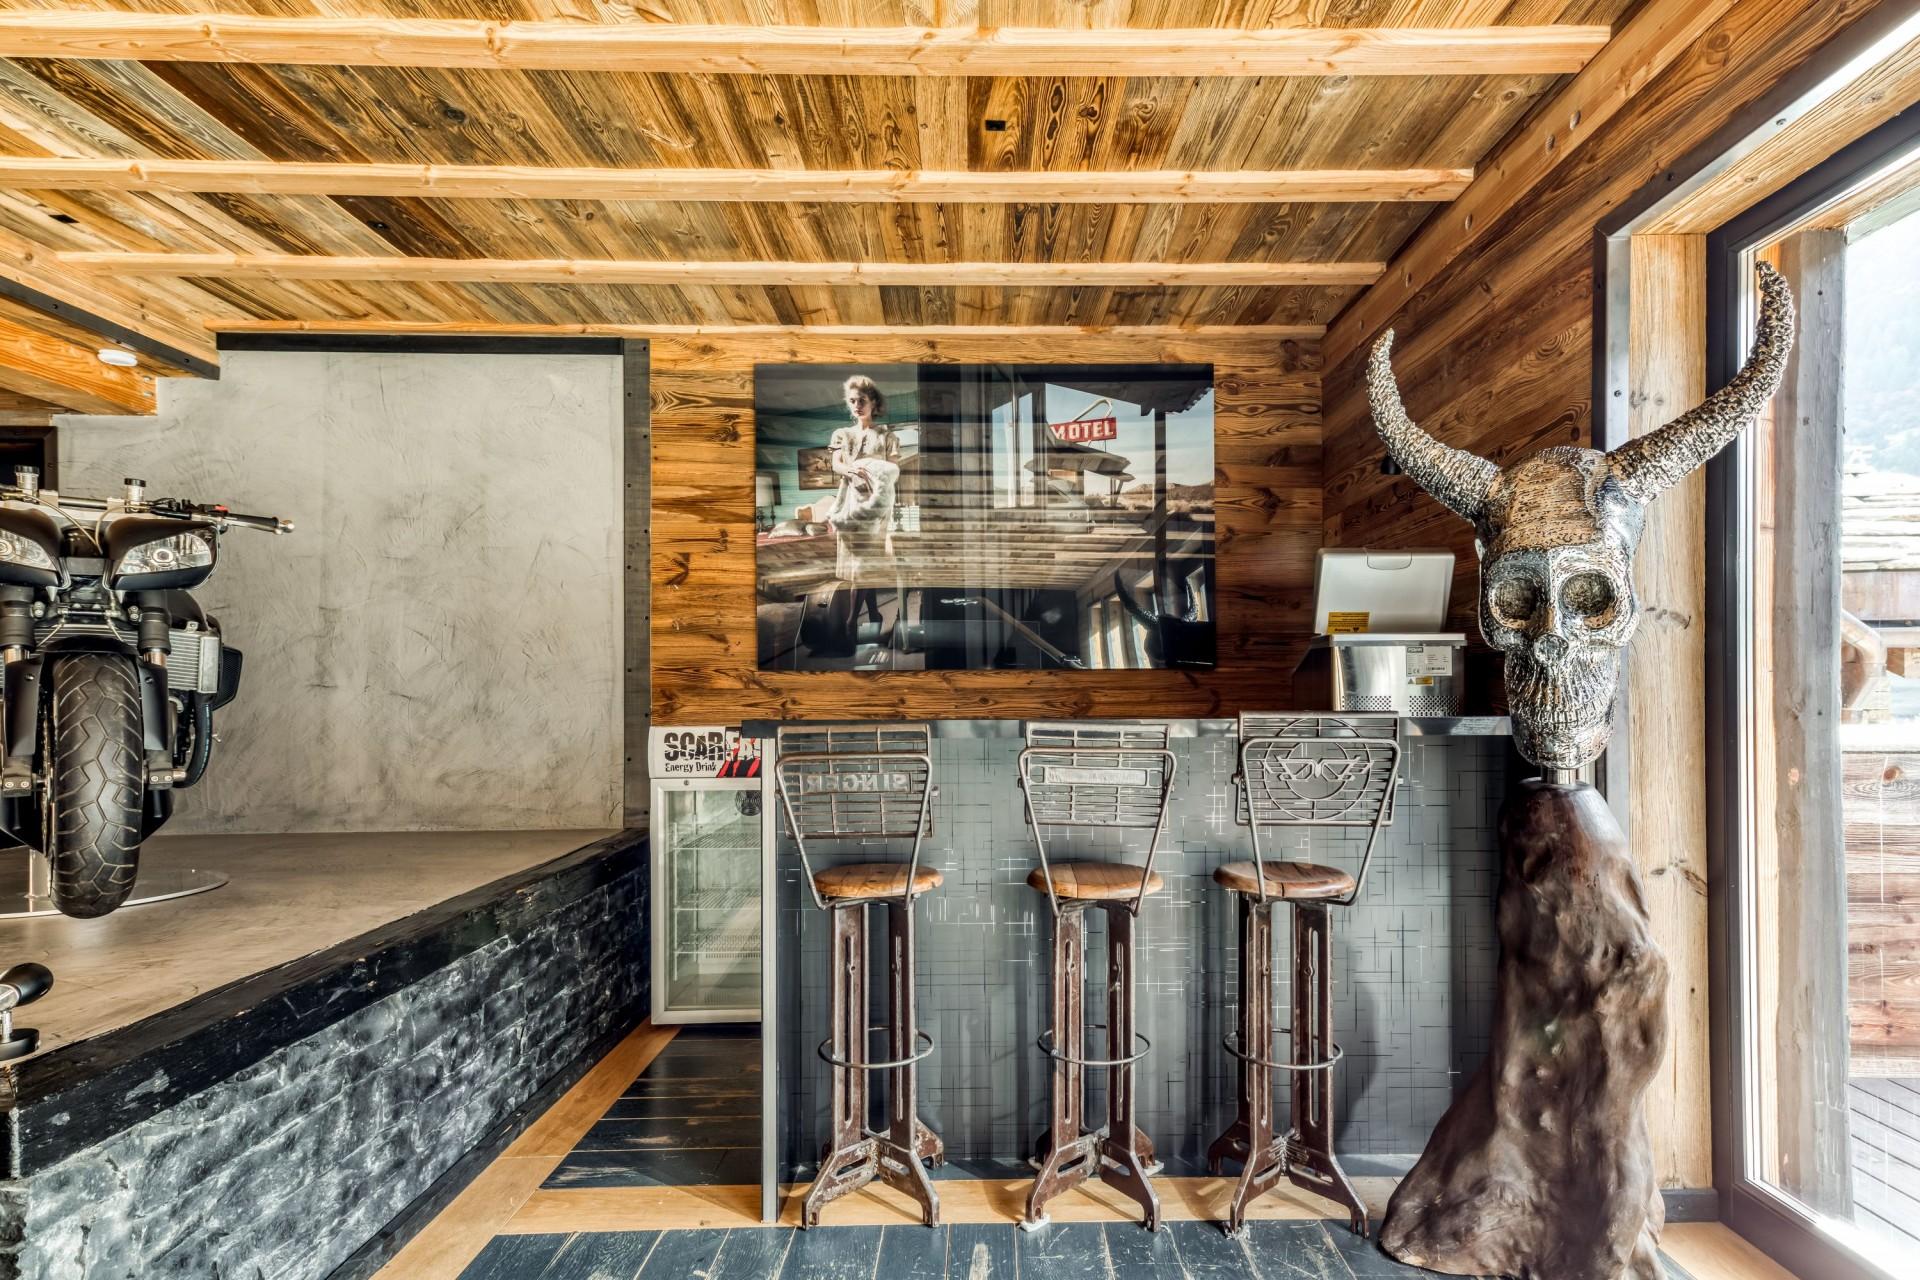 Tignes Location Chalet Luxe Tavanite Bar